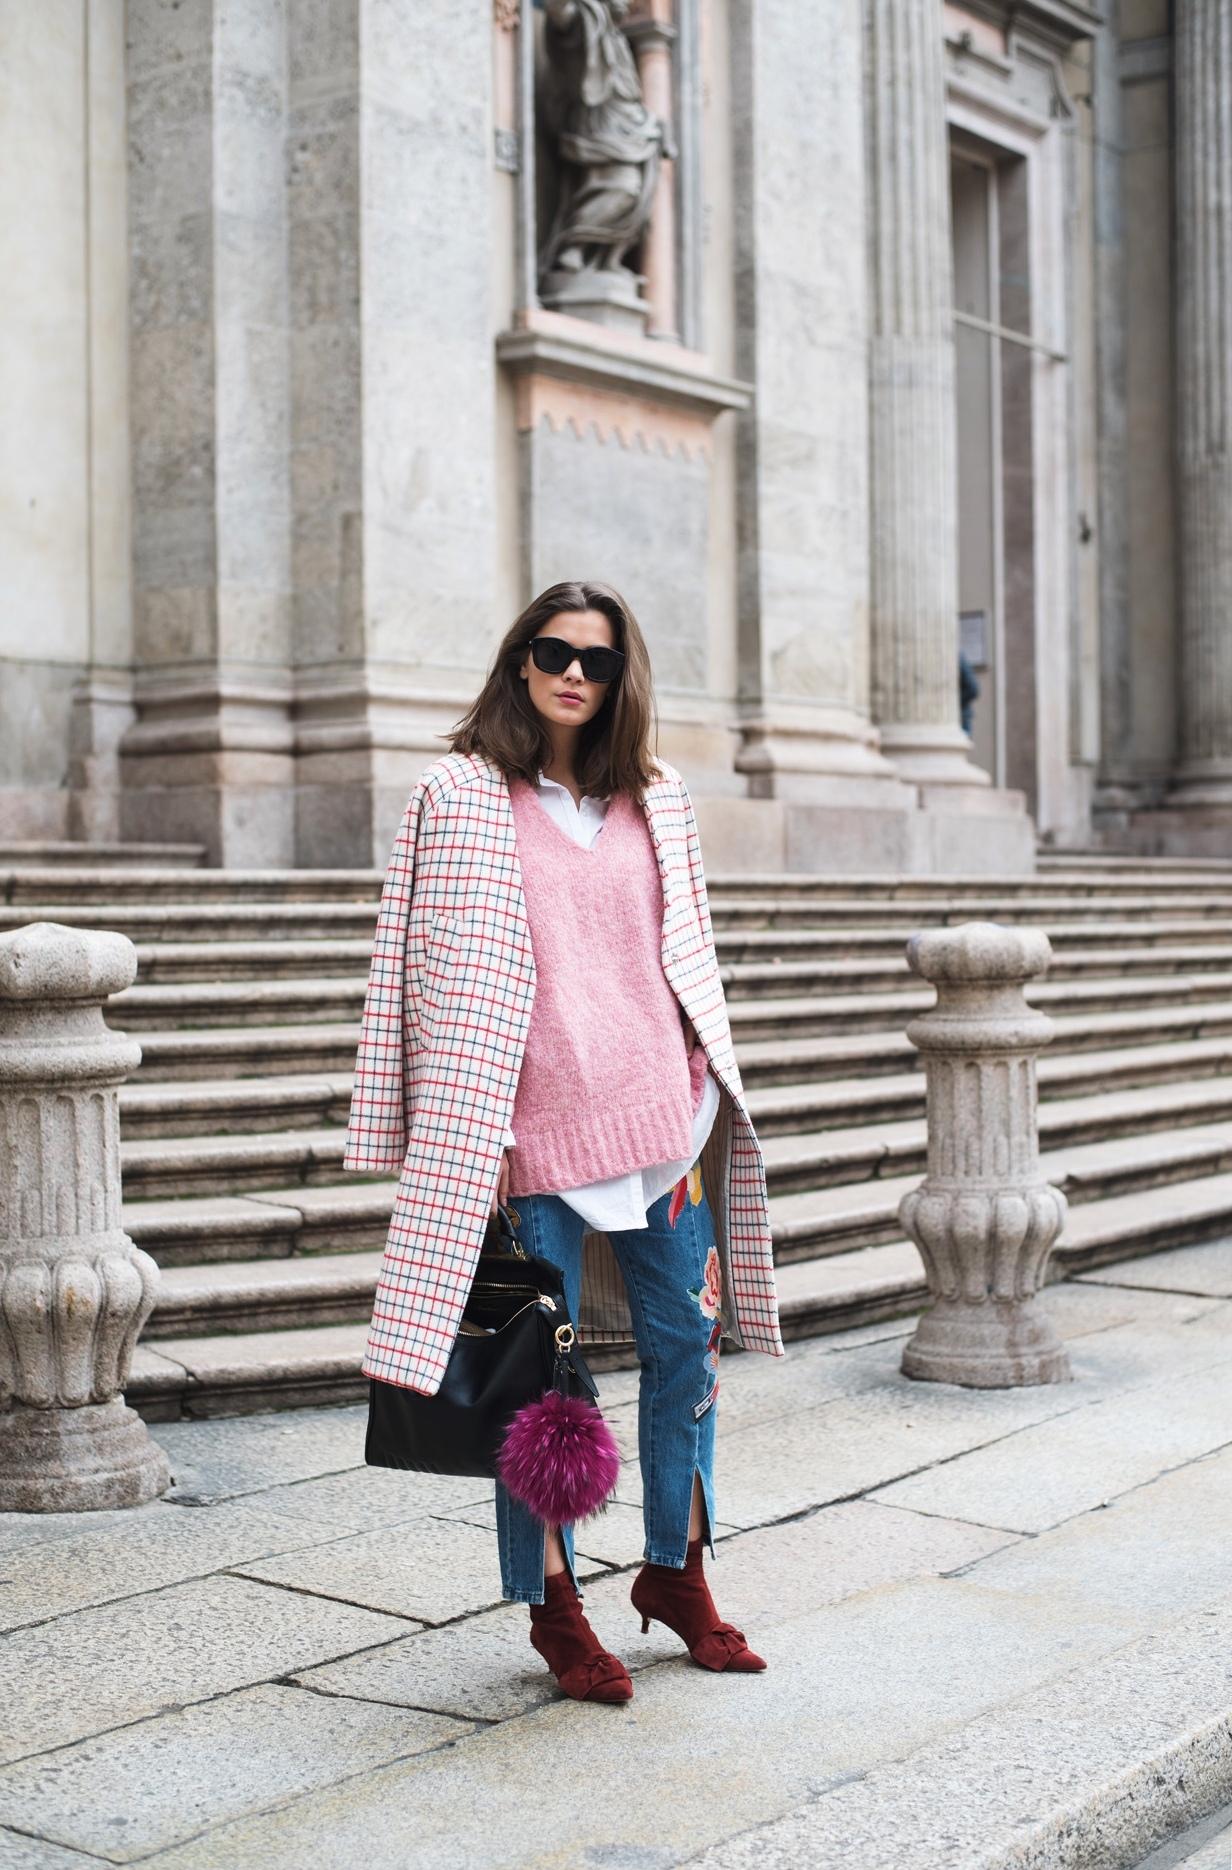 le-specs-runaways-sonnenbrille-schwarz-blogger-streetstyle-fashiioncarpet